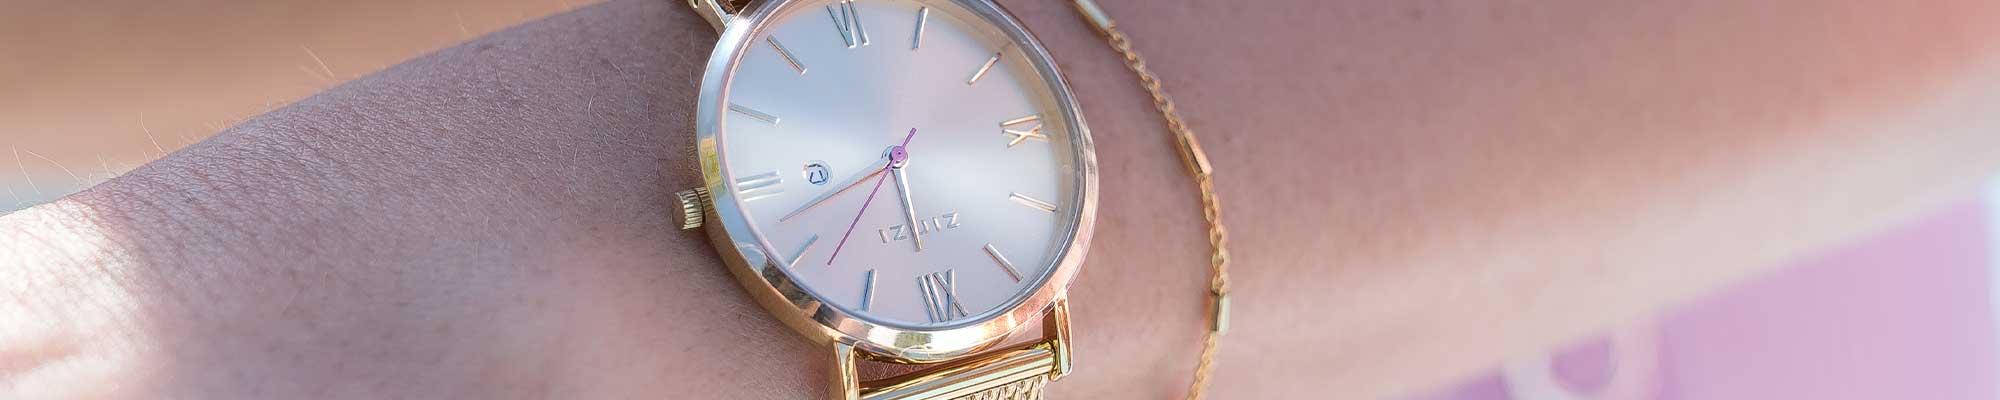 Roman Horloges